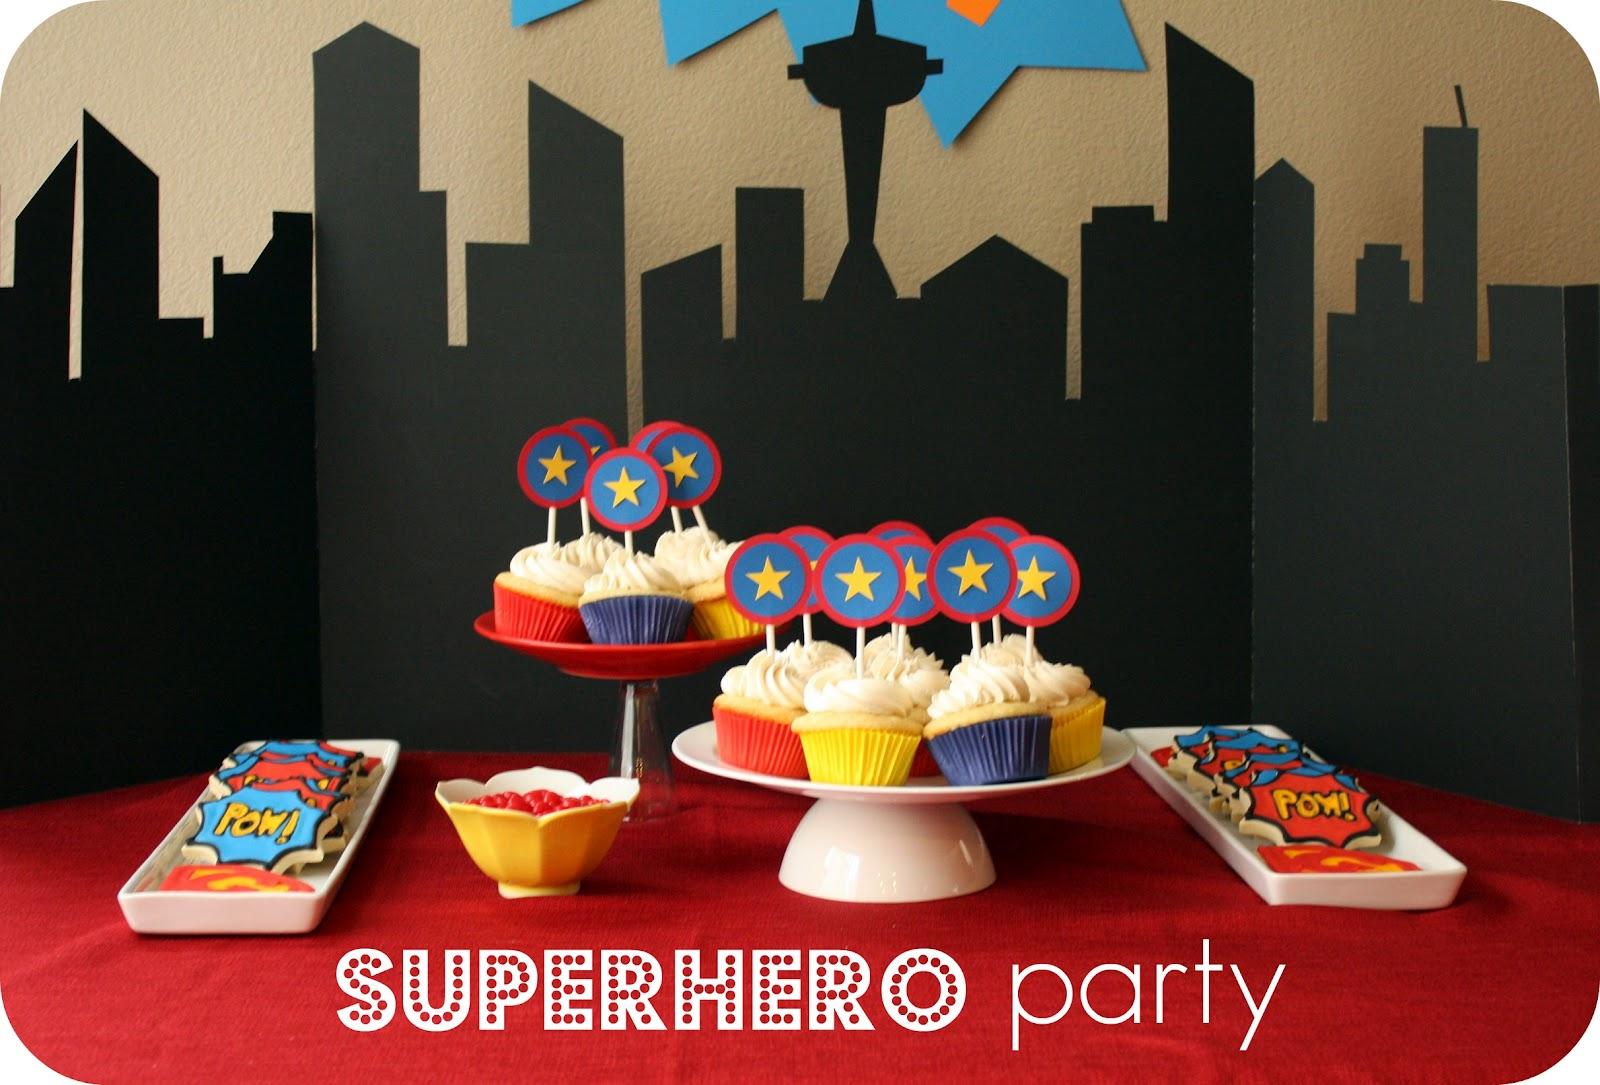 Superhero Party Treats And A Free Printable - Free Printable Superhero Skyline